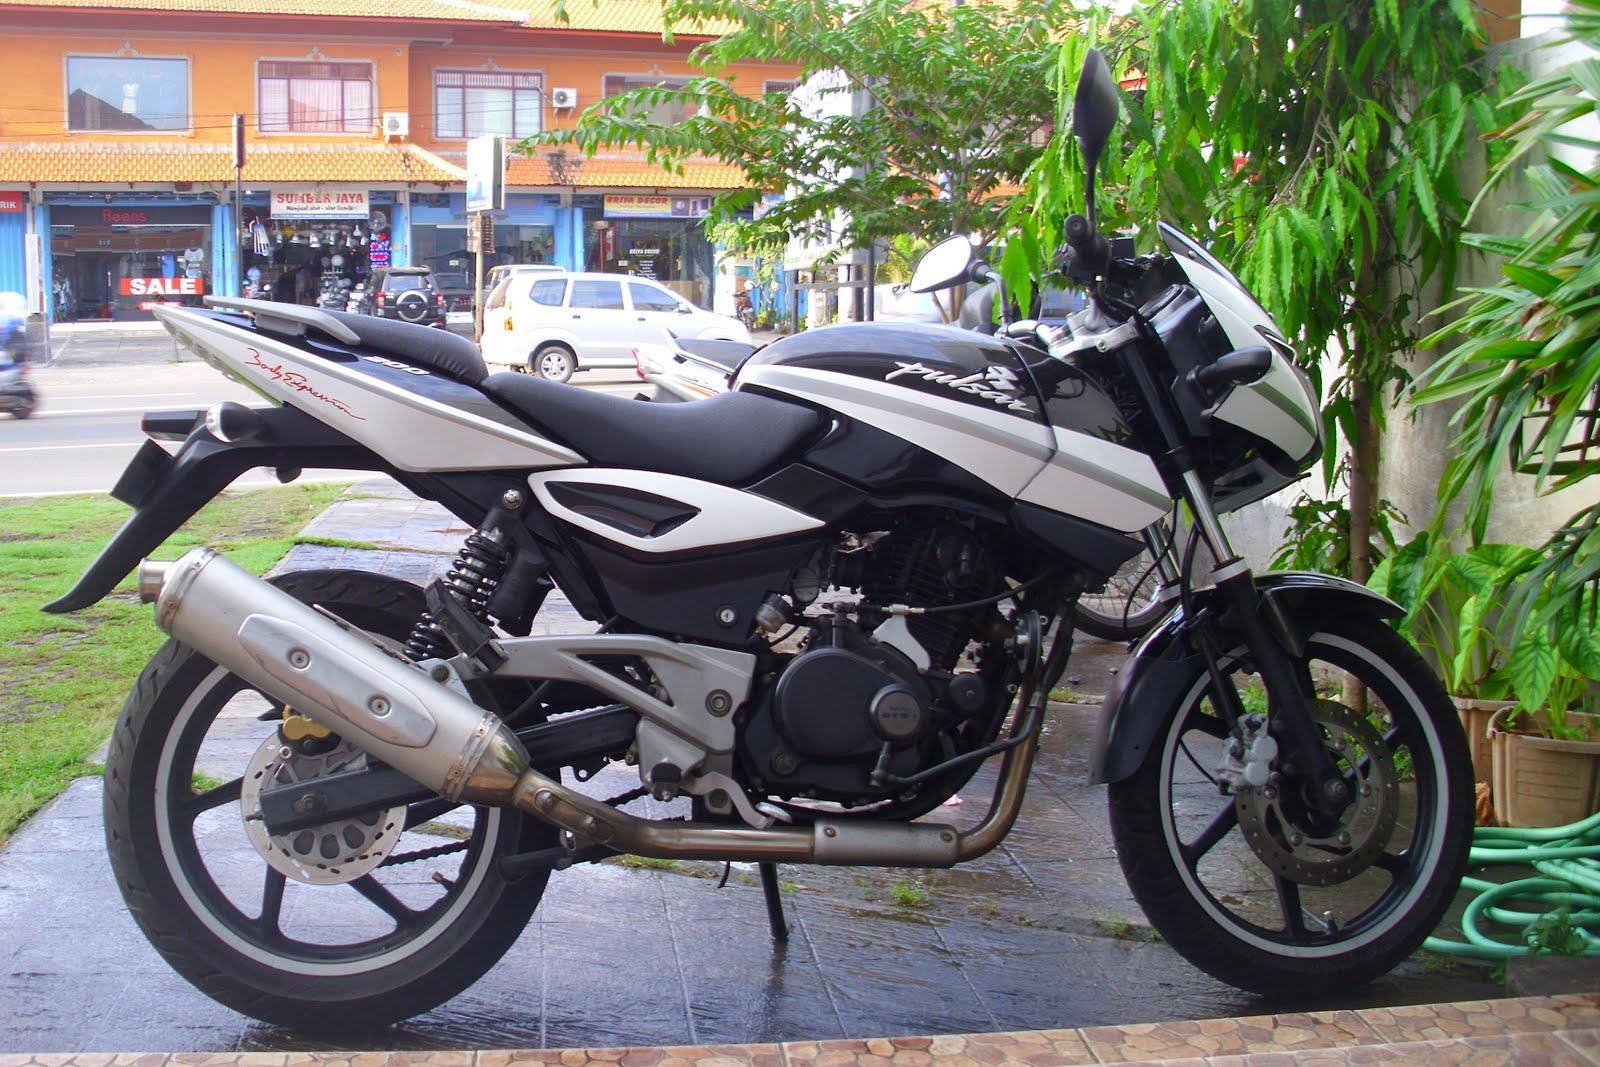 3C Bali Ride, Eat, Rest, Pray & Repeat